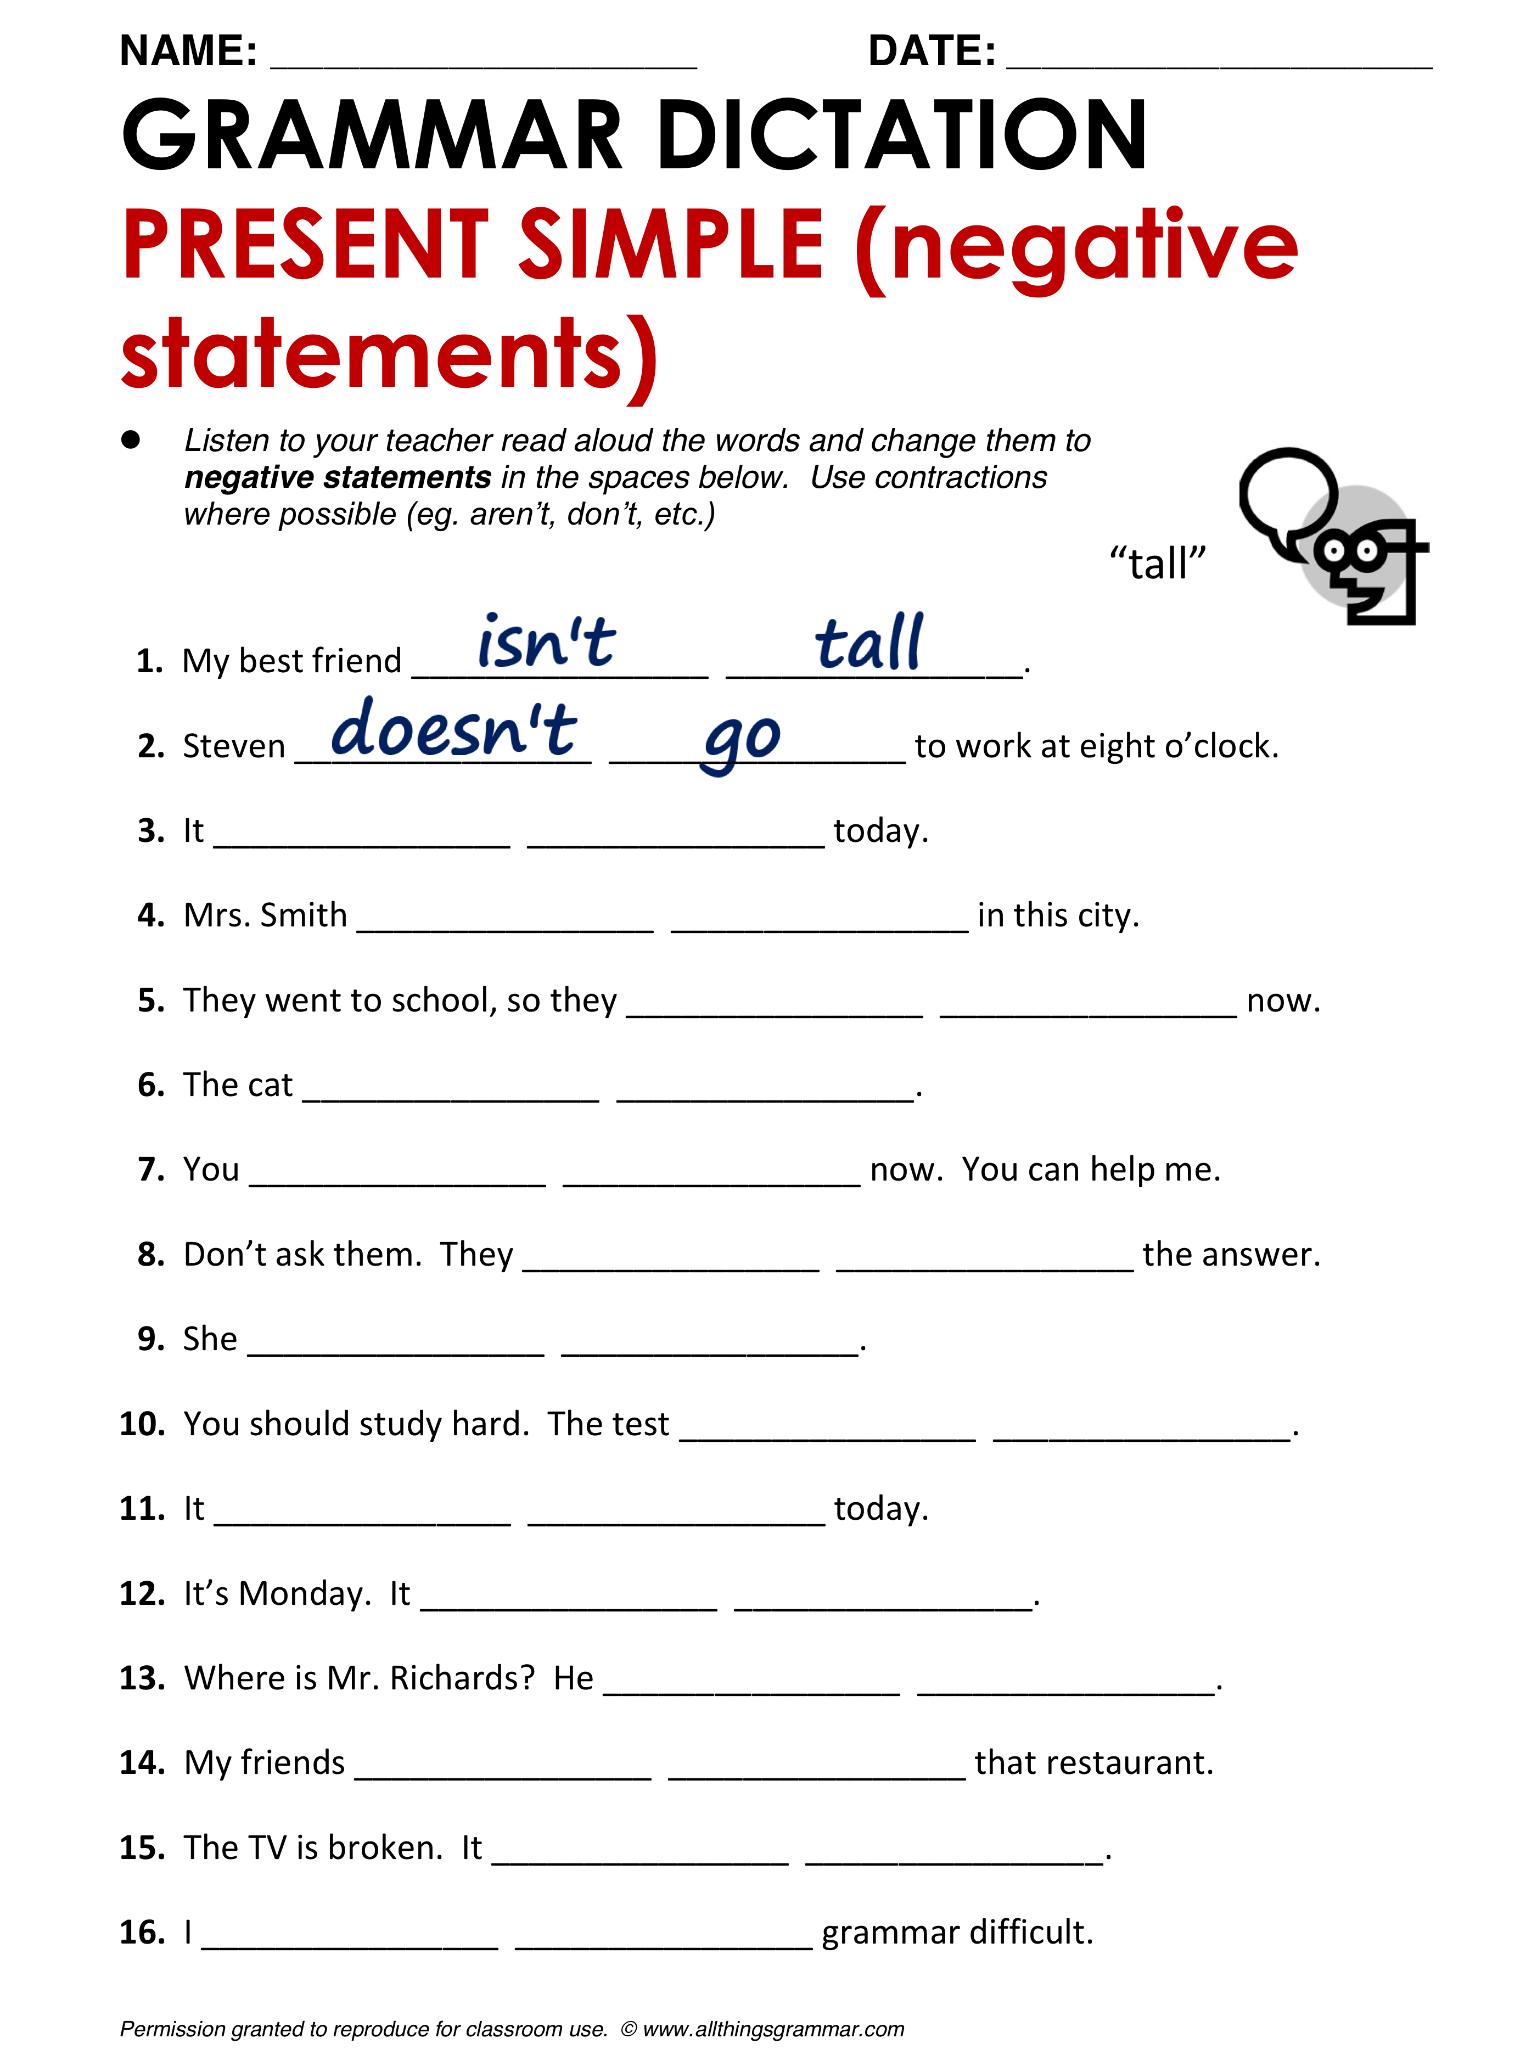 Negative Statements Worksheet